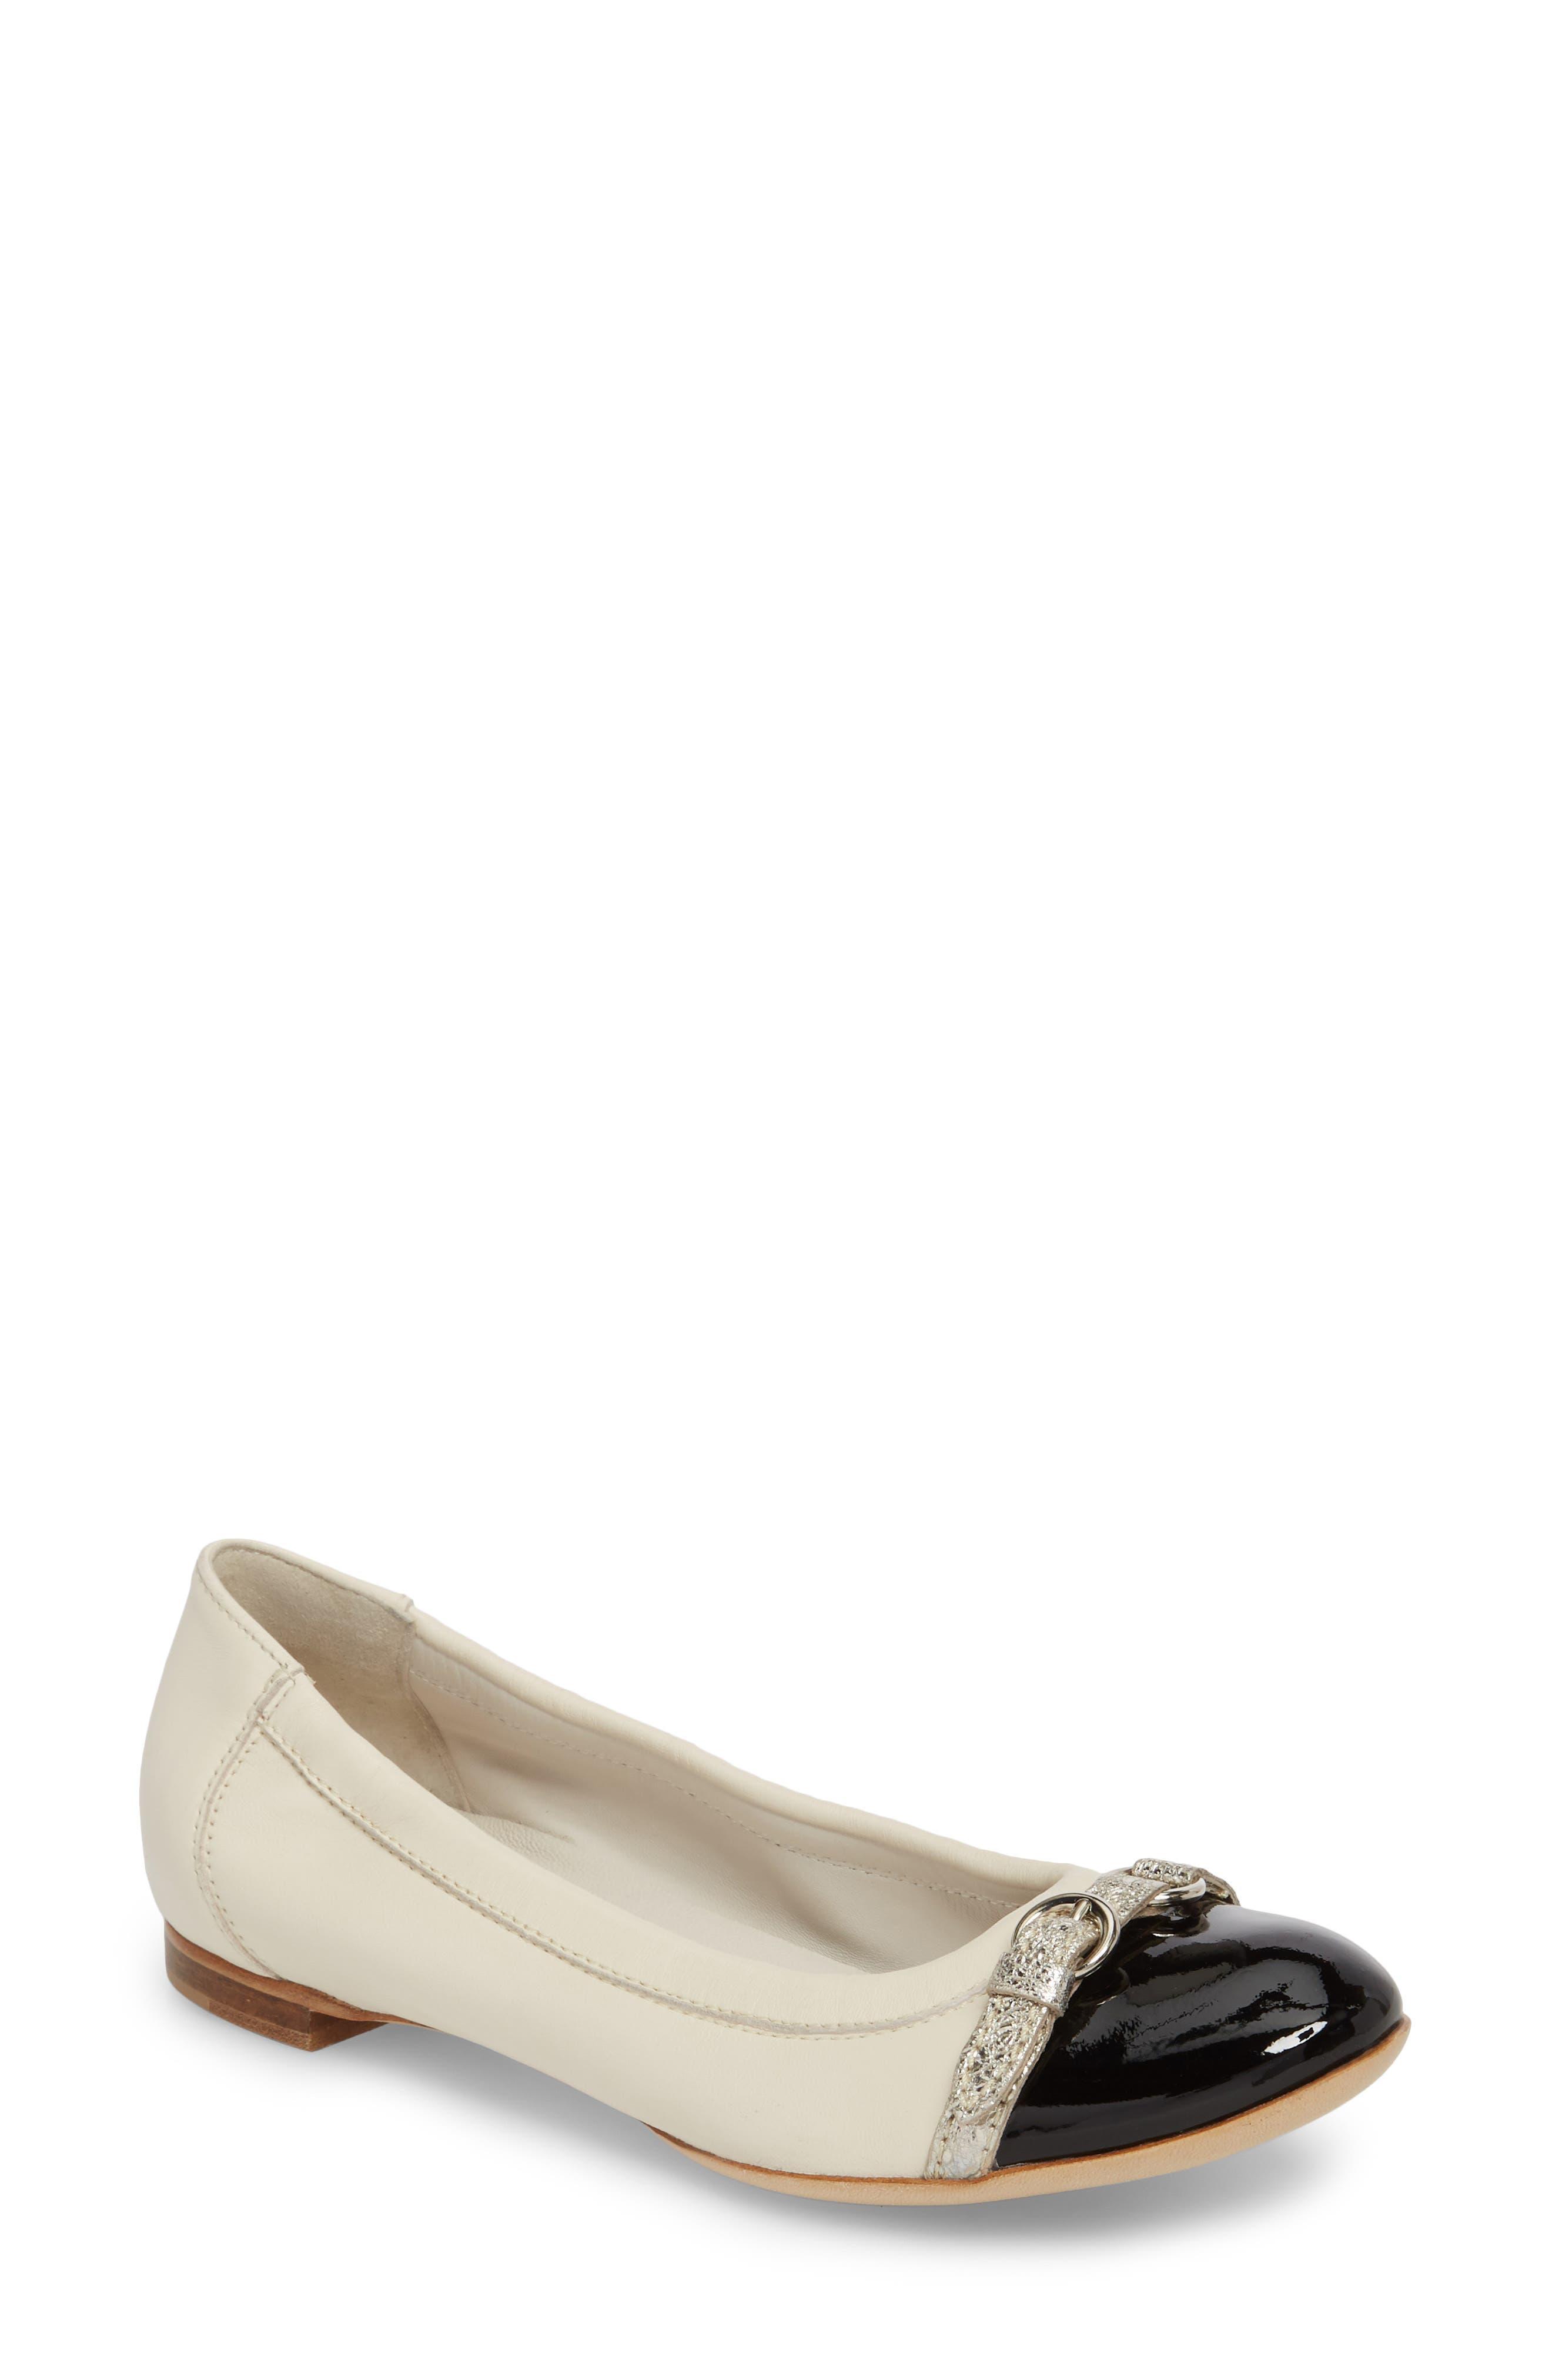 Agl Cap Toe Ballet Flat - White